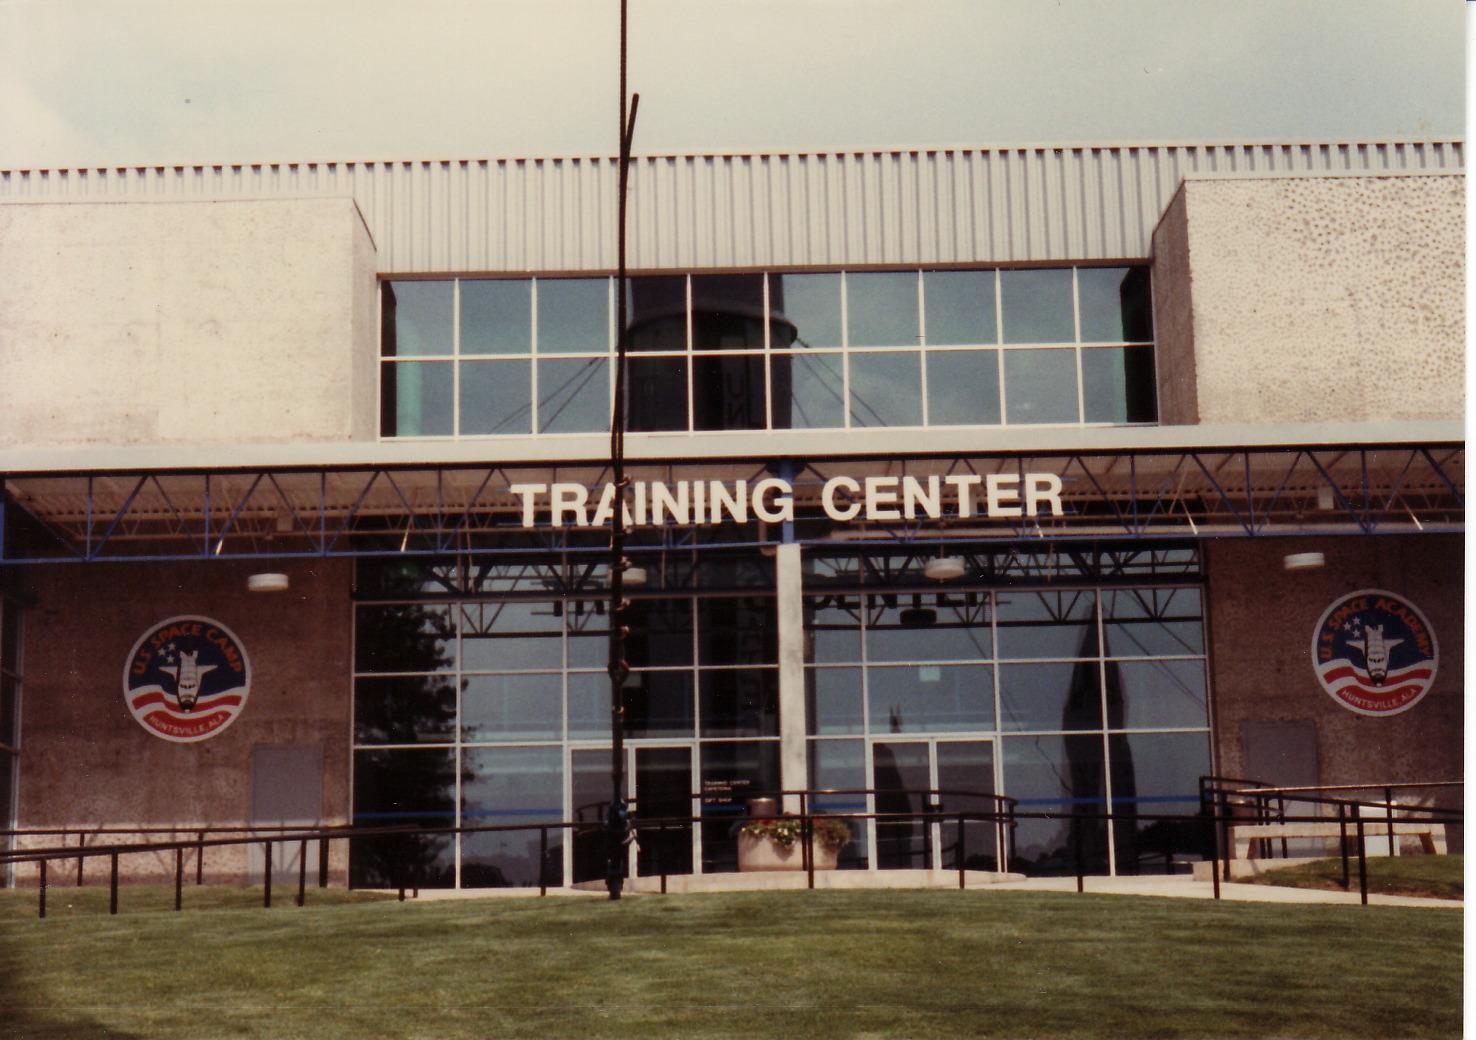 Training Center Doors